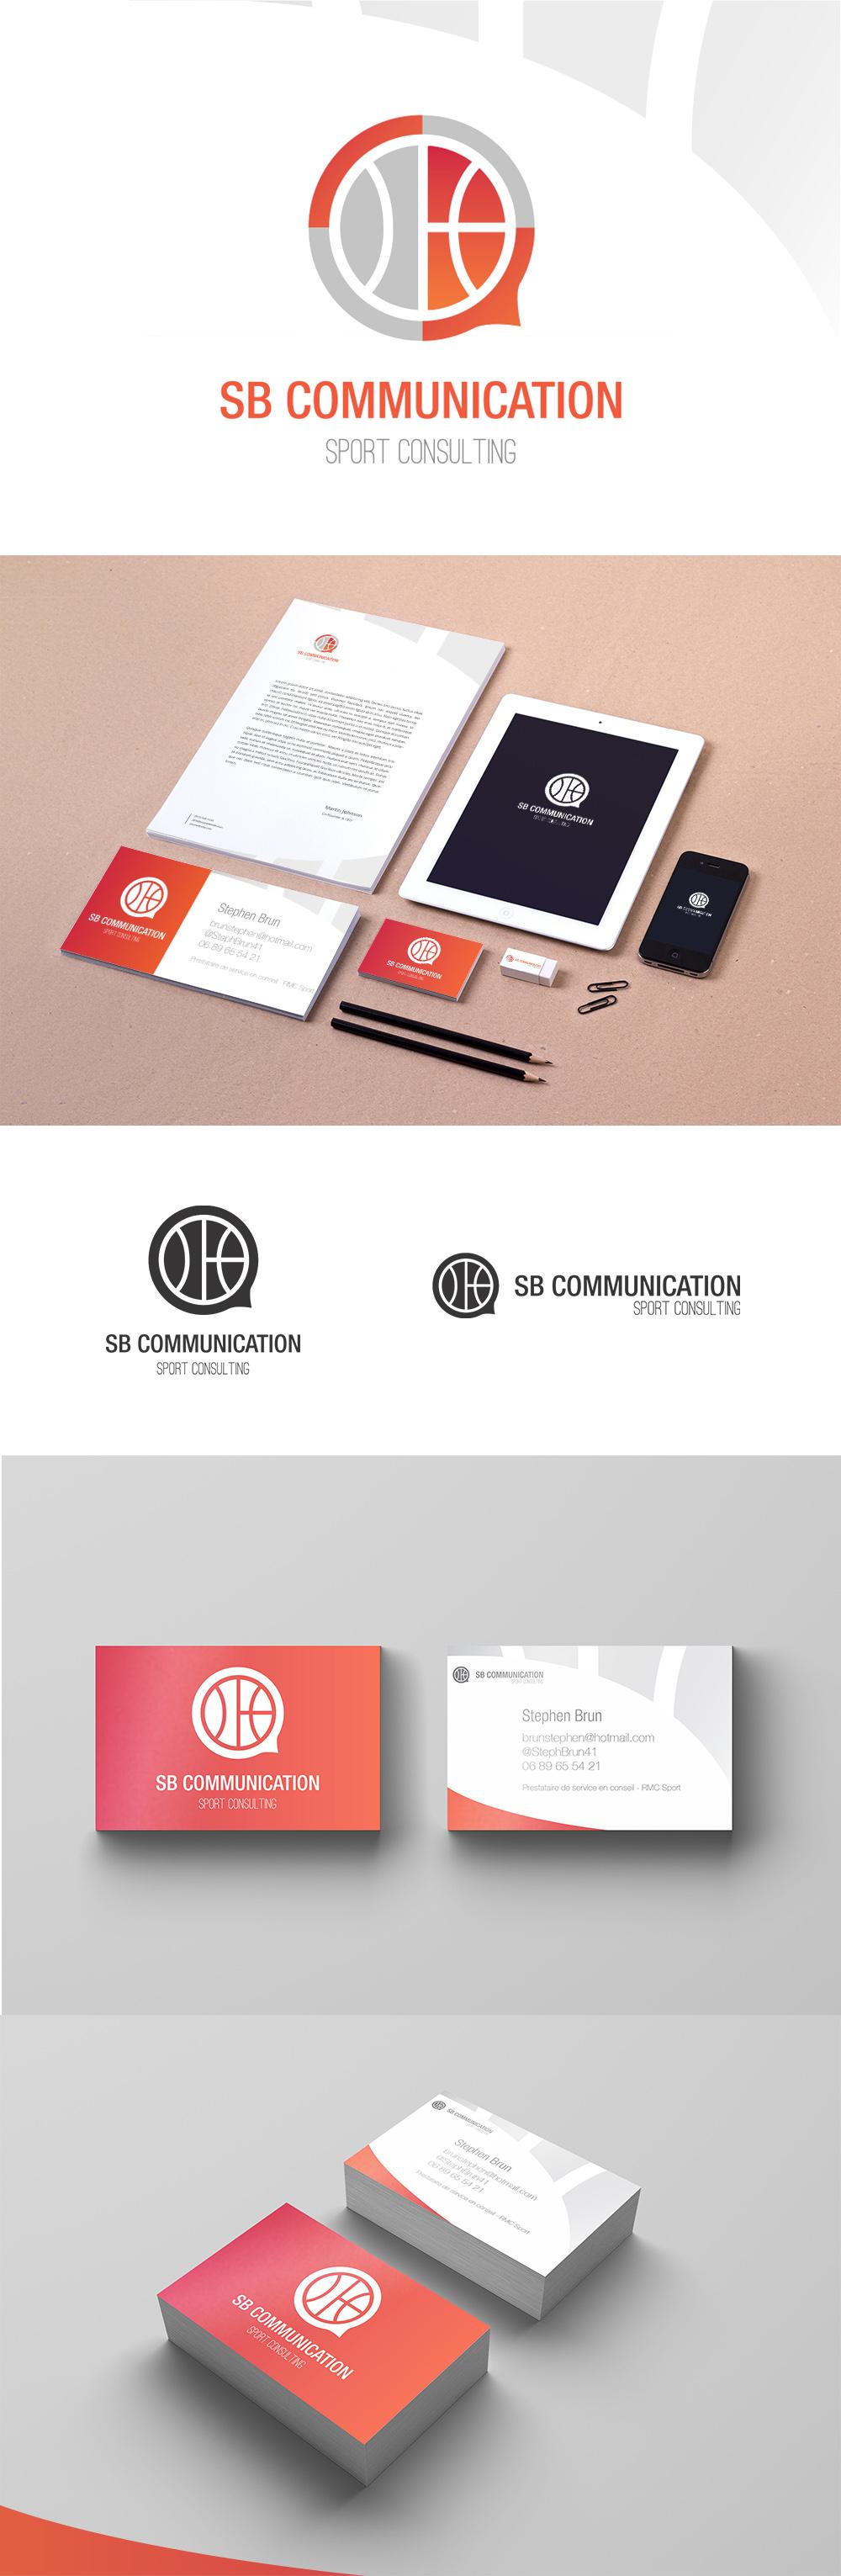 visuel SB Communication